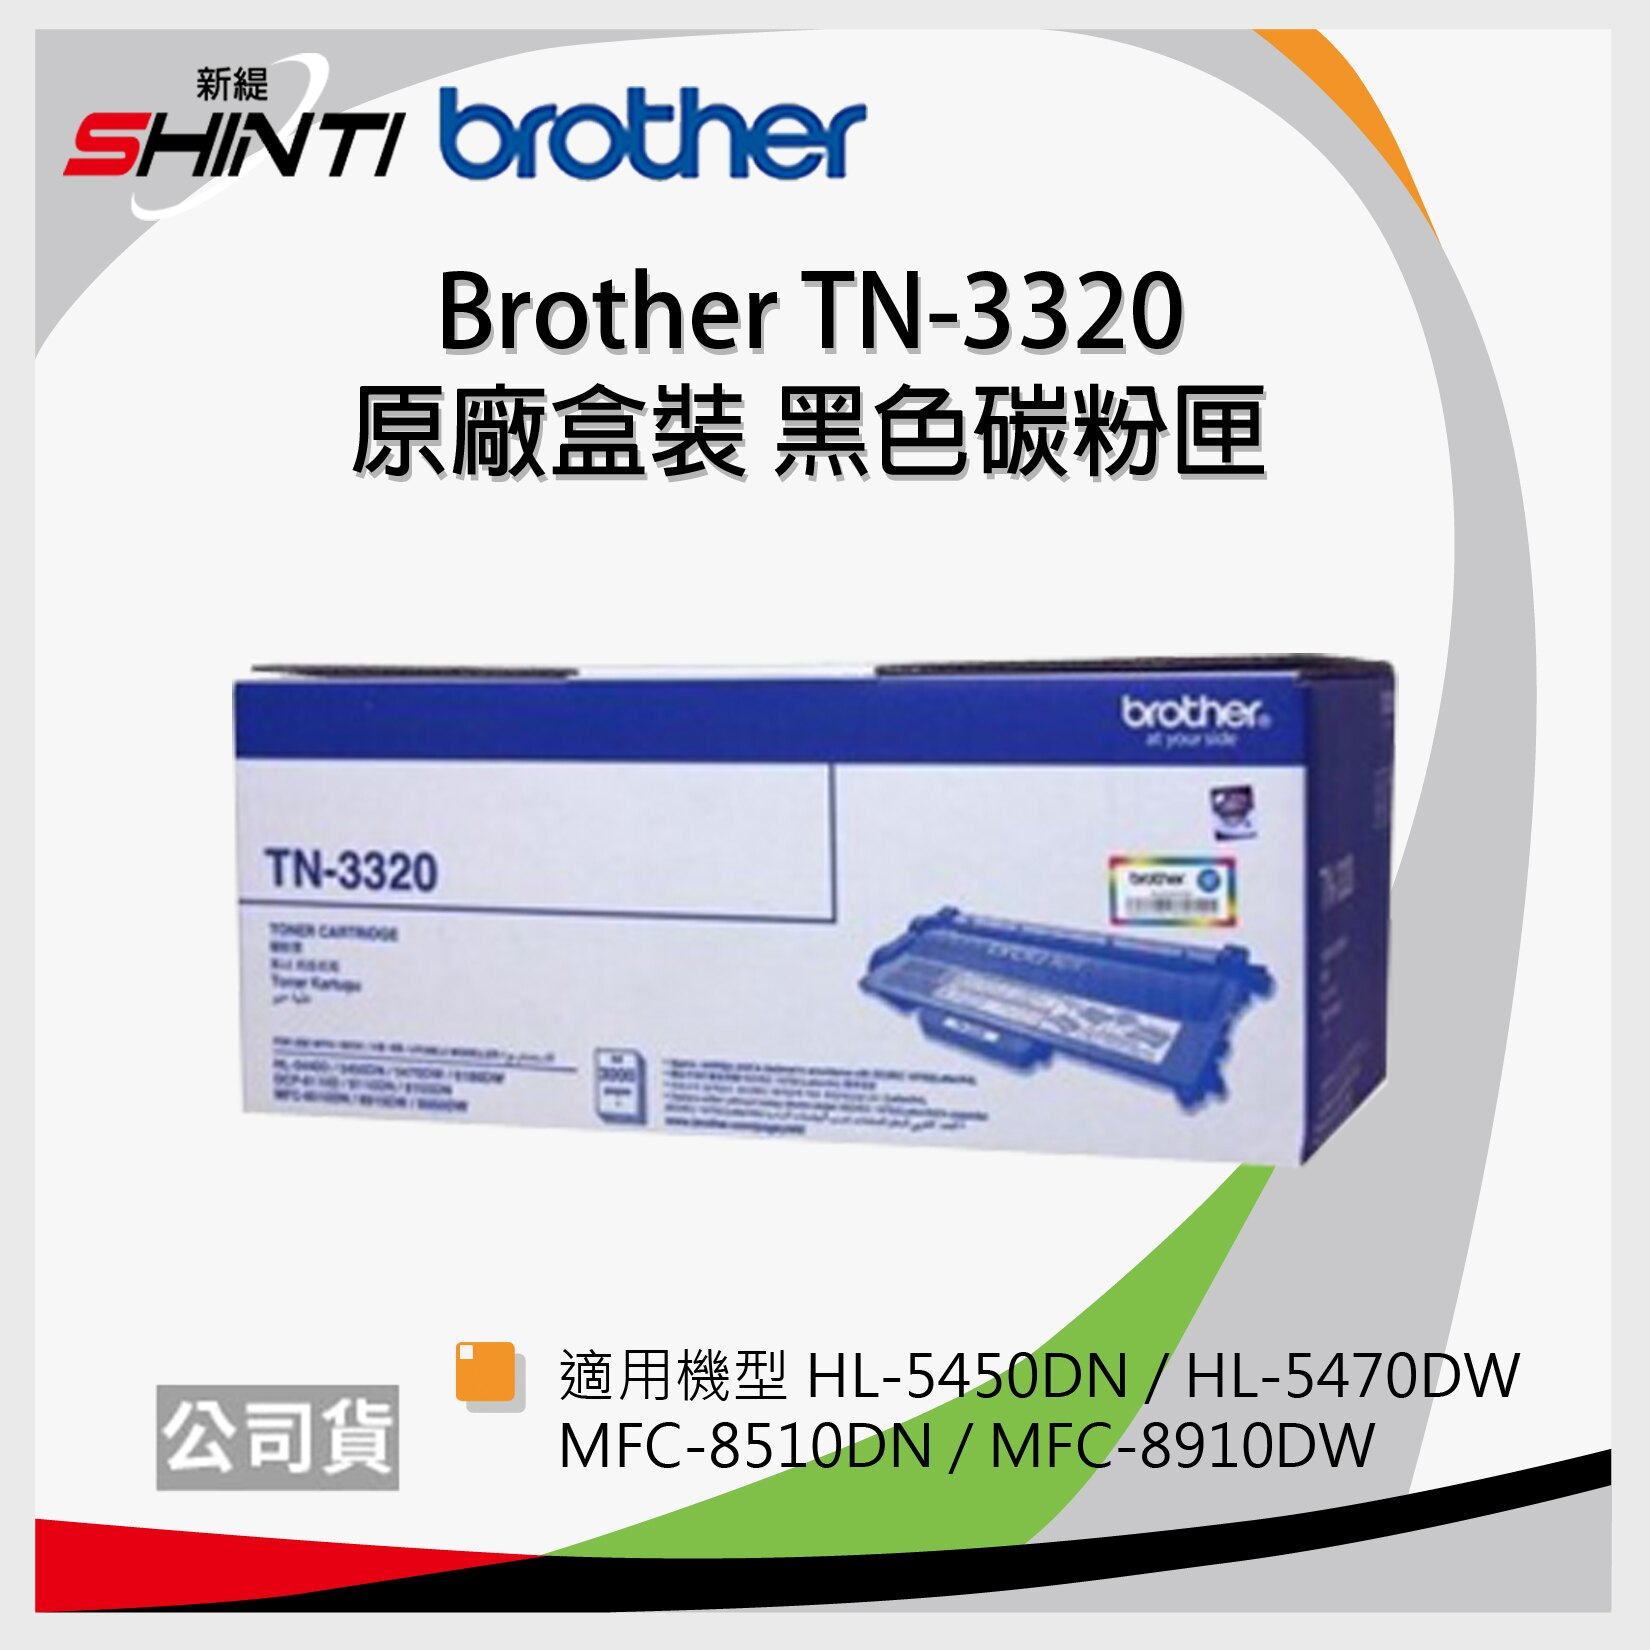 【免運】brother TN-3320 原廠標準容量雷射碳粉匣 *適用機型:HL-5440D/HL-5450DN/HL-5470DW/HL- 6180DW/DCP-8155DN/MFC-8510DN/..